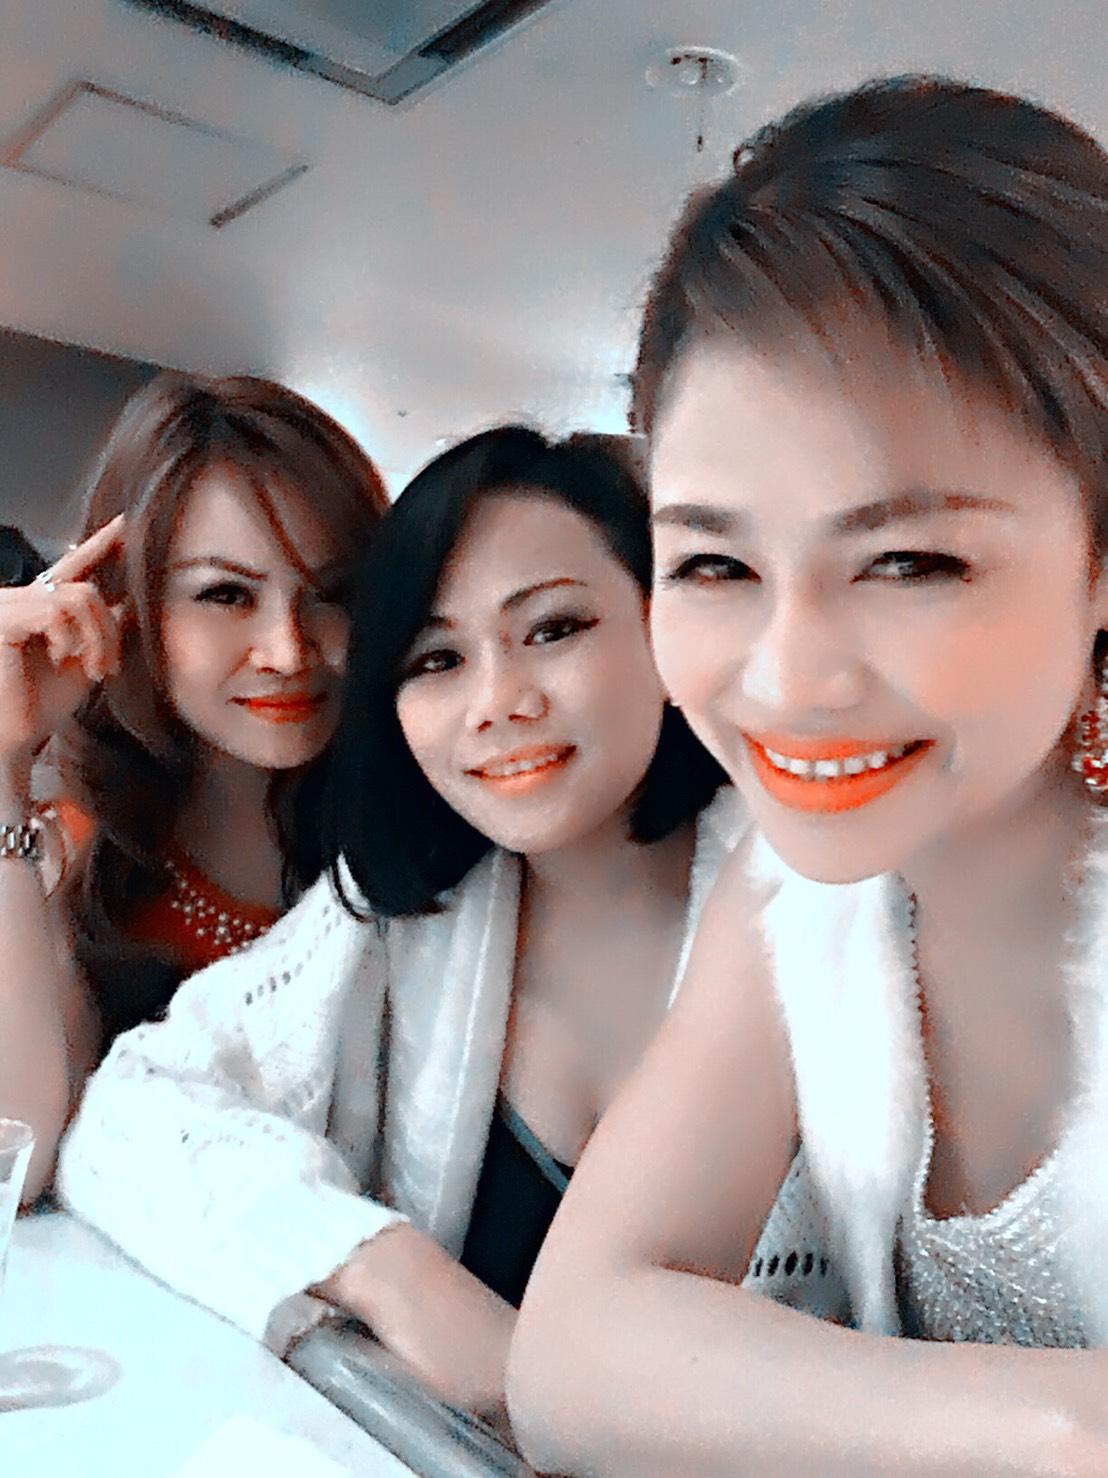 S__5439569